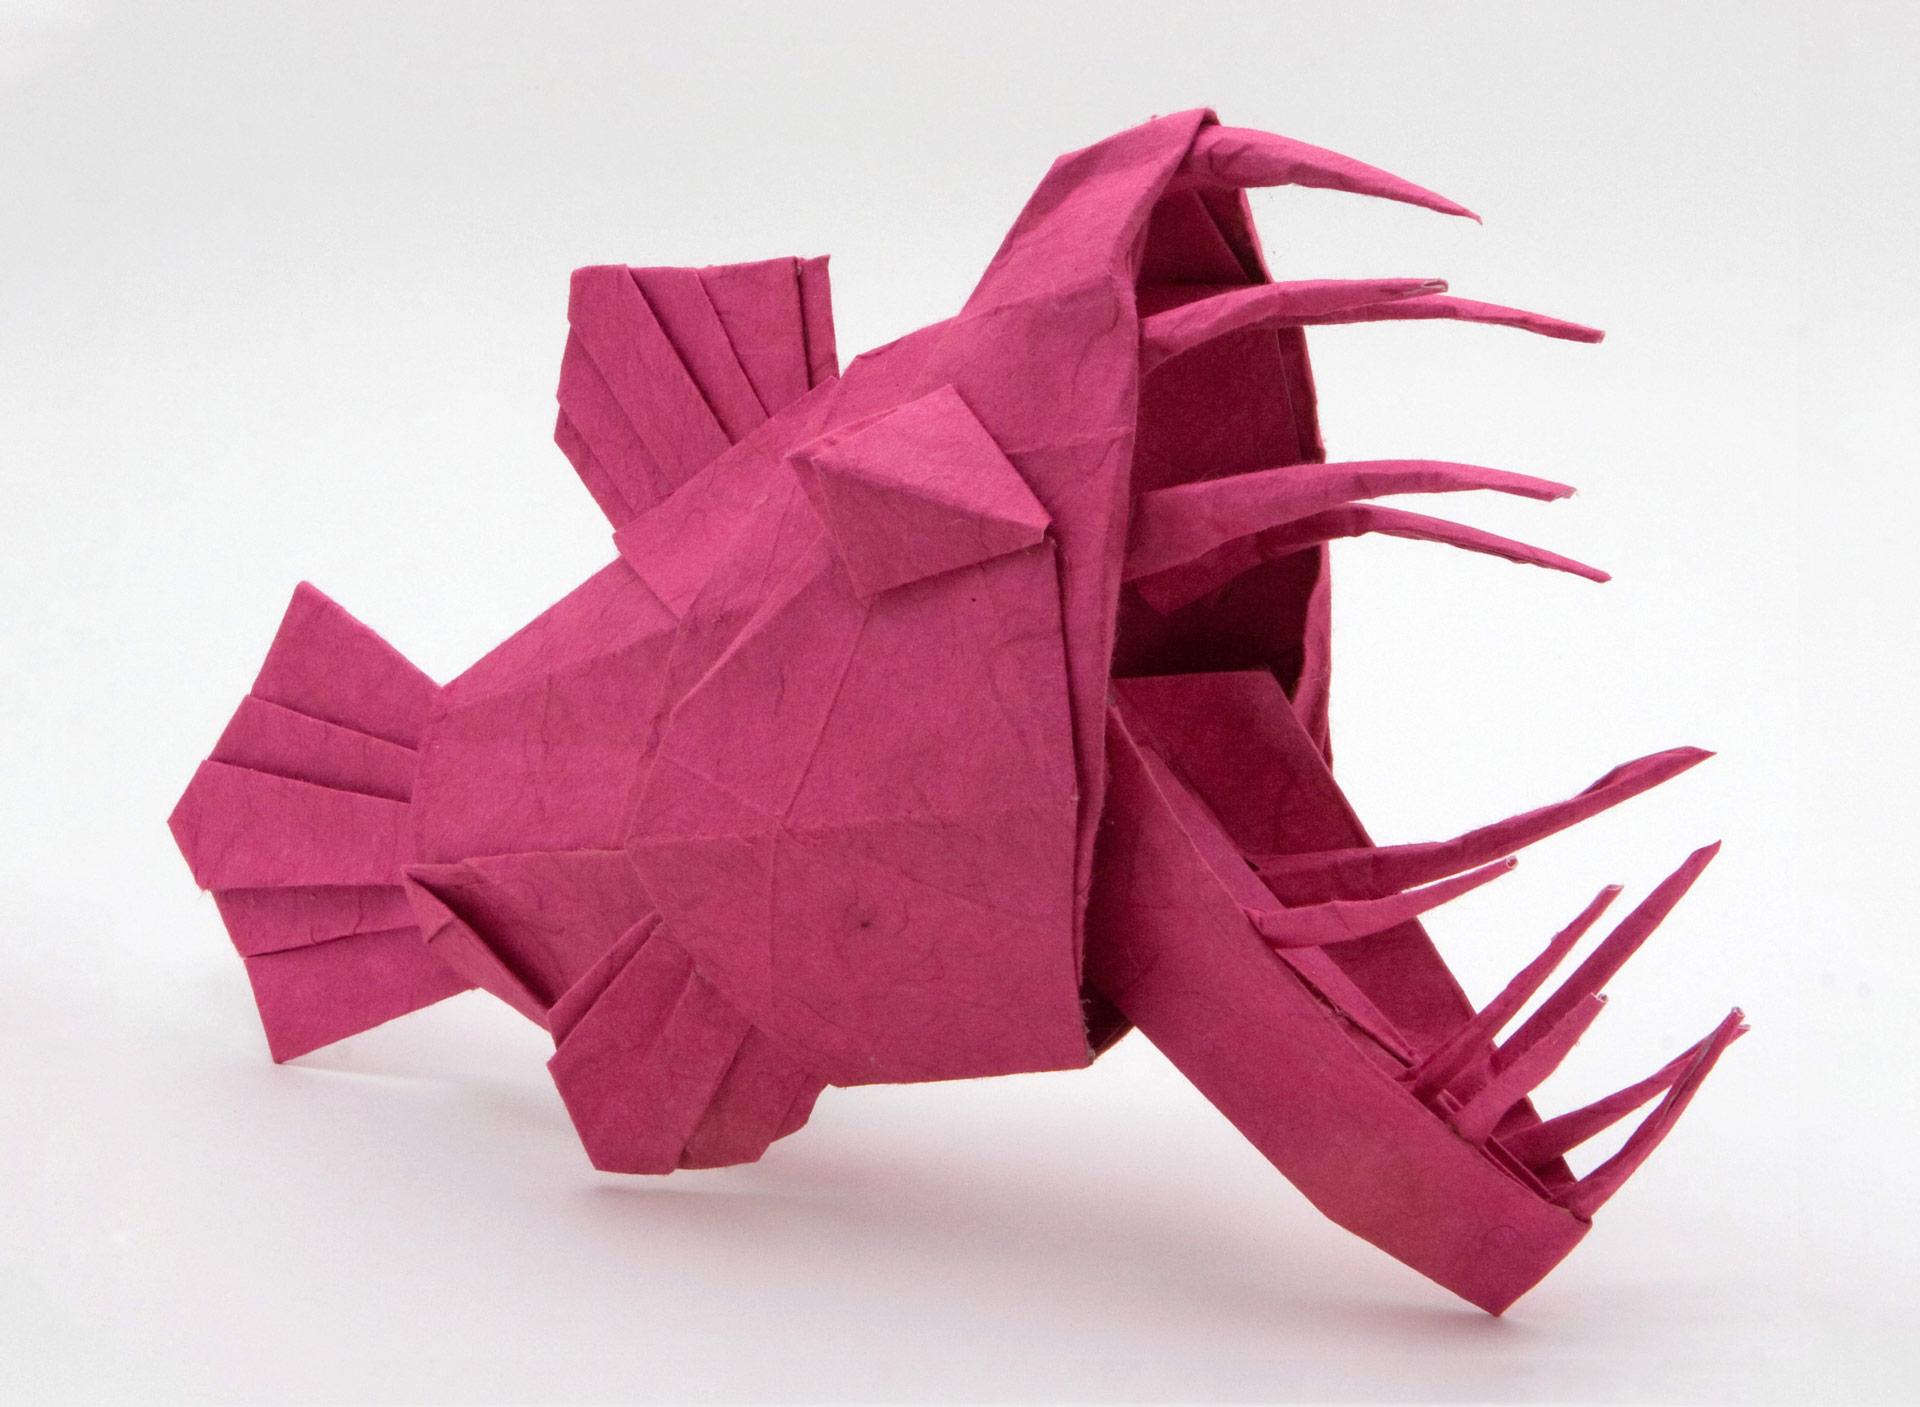 Faire poisson origami avril origami day chaque jour - Origami rose facile a faire ...